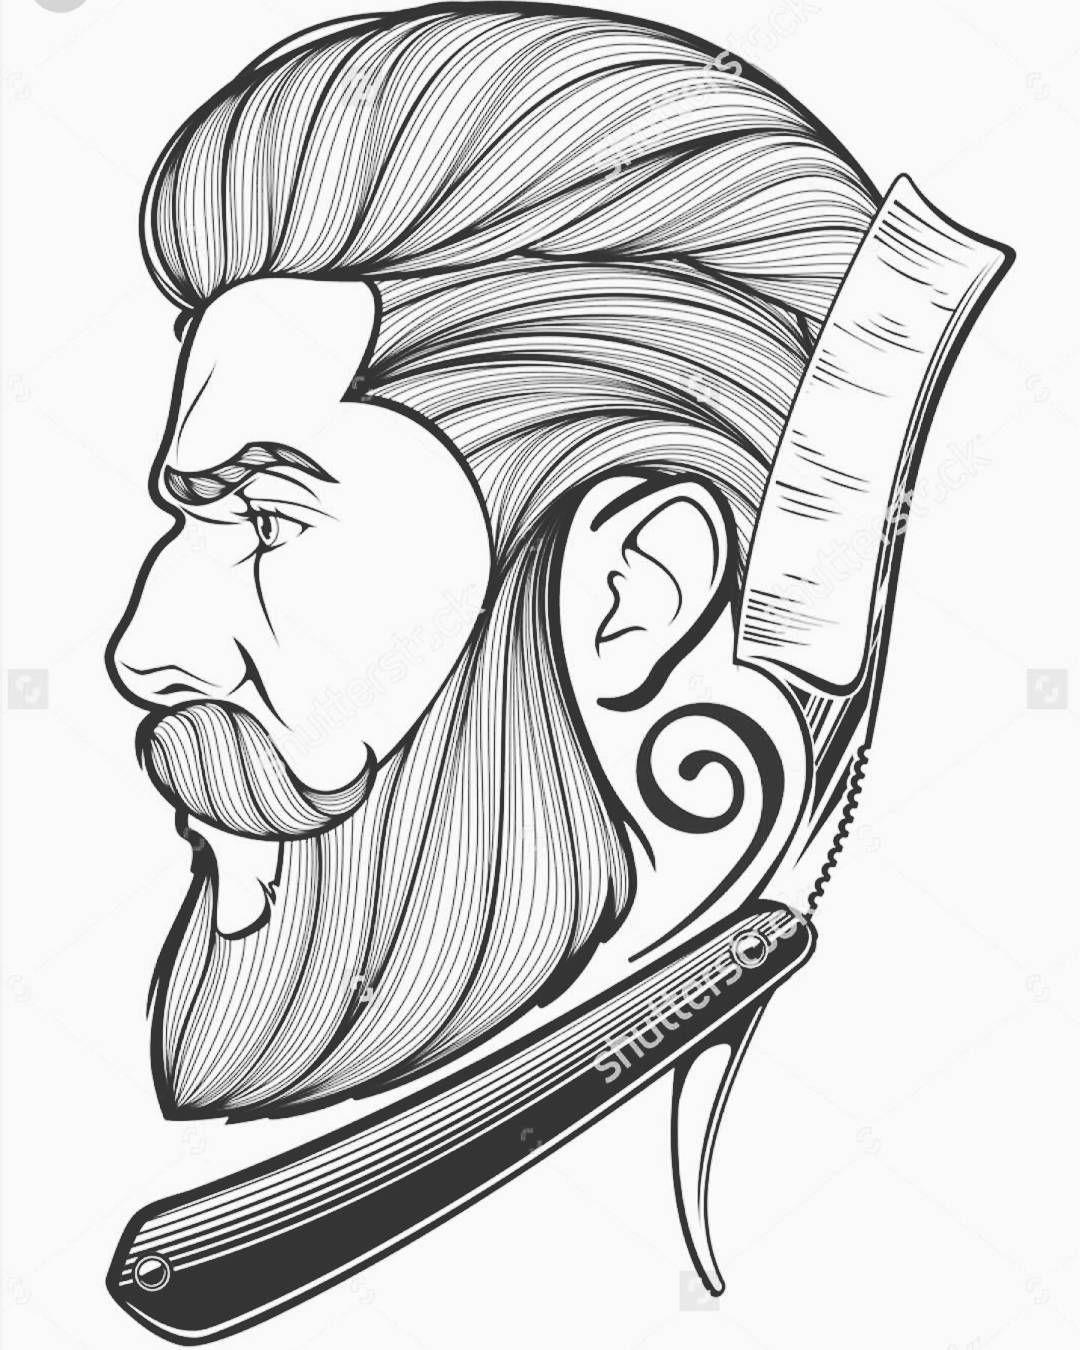 32 Likes 3 Comments Gq Barbersalons Rhode Island Gqbarbersalons401 On Instagram Get Groomed Gqbarbersalons Beard Art Barber Tattoo Barbershop Design